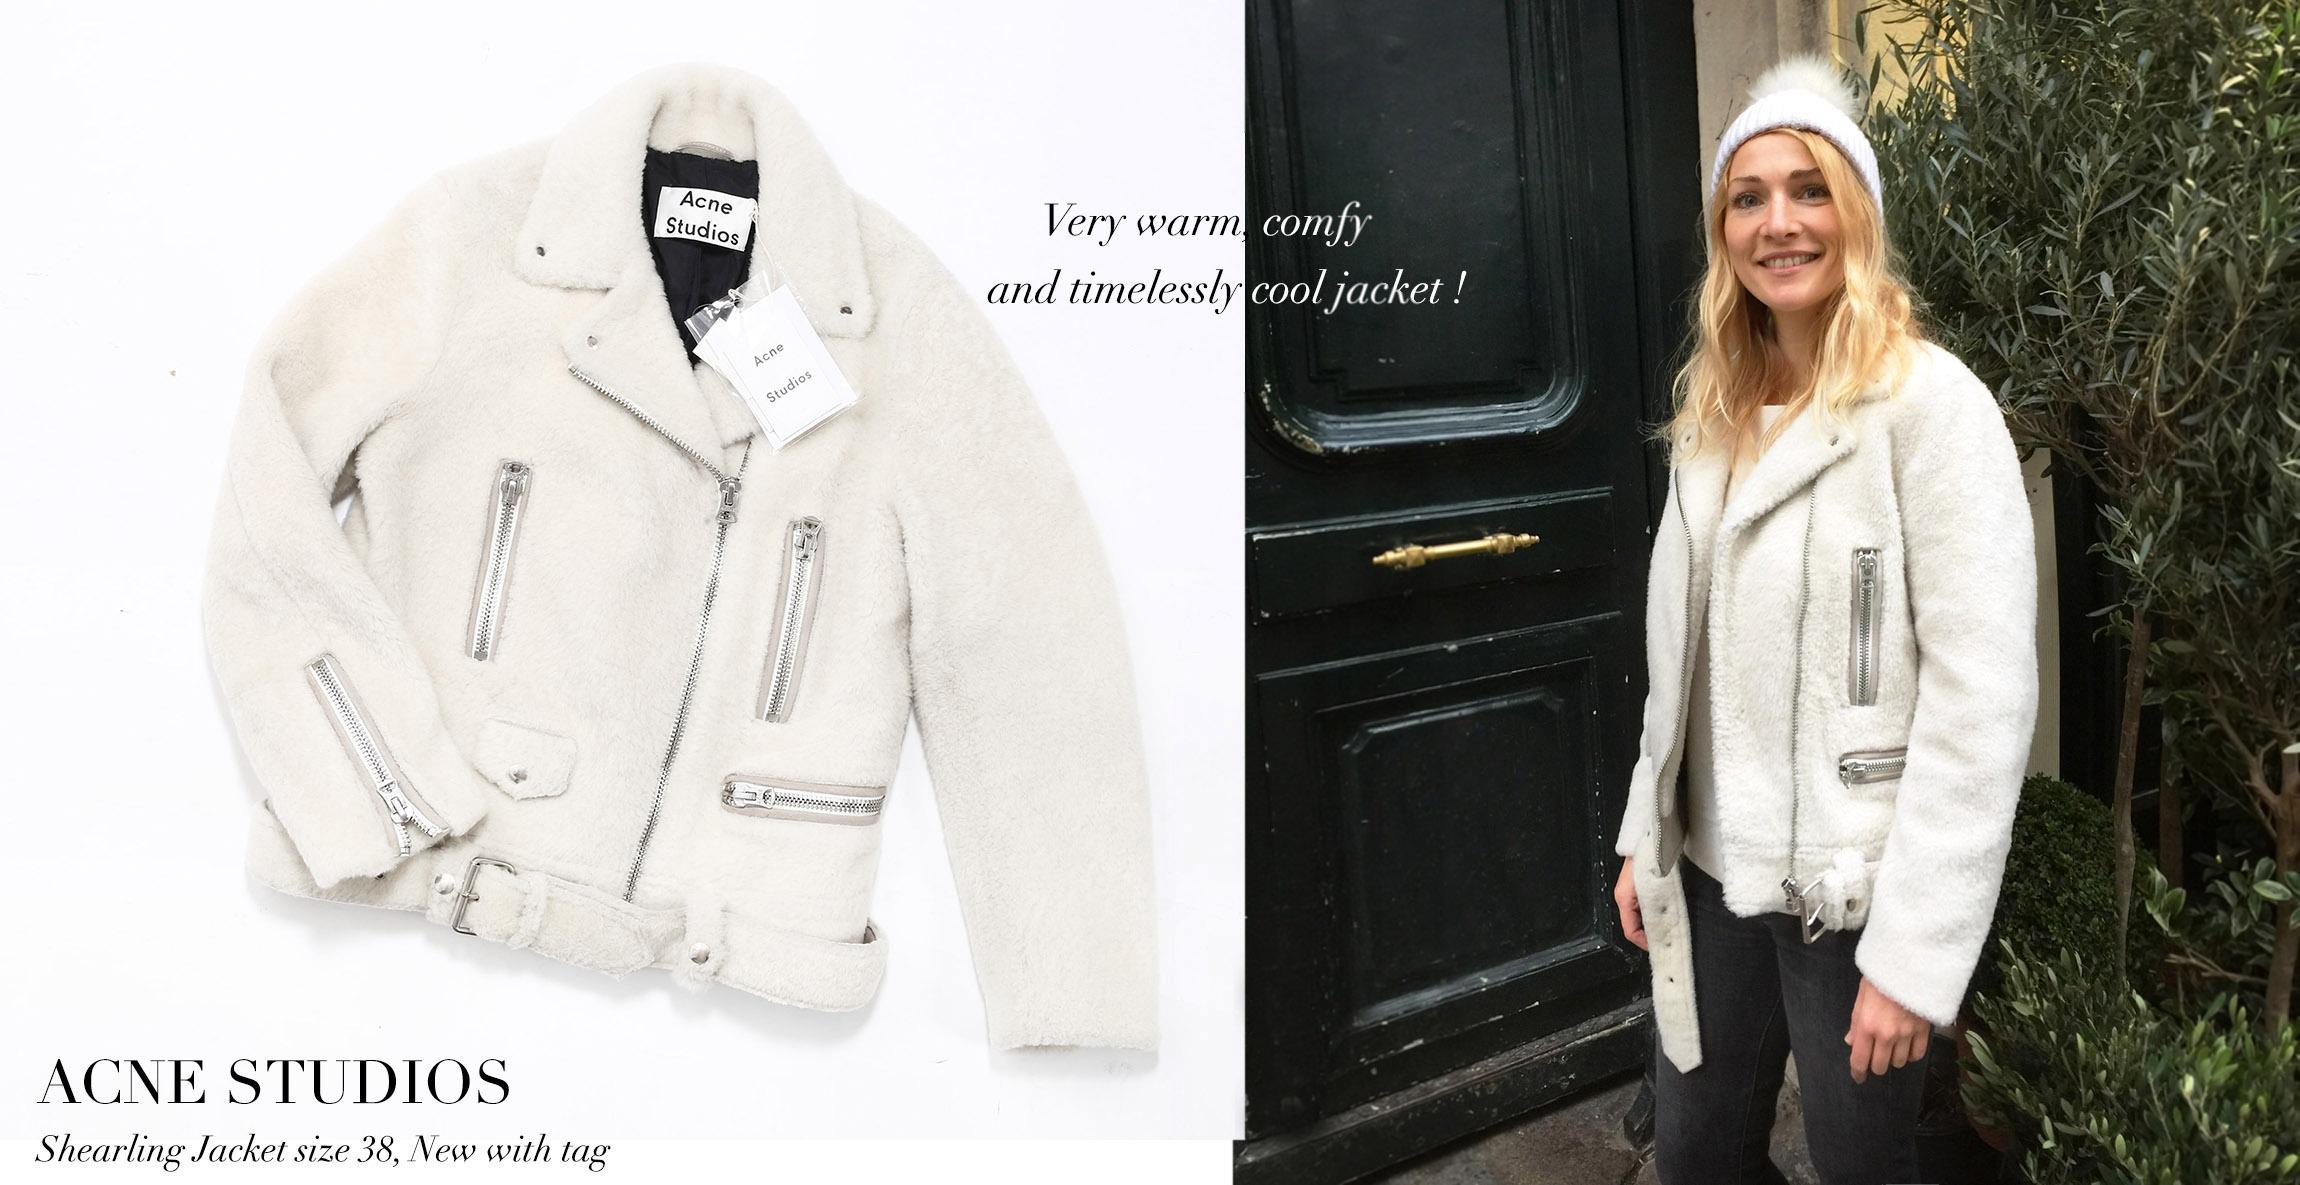 efe60bab39b3 ACNE STUDIOS Veste biker shearling jacket MERLYN blanc ivoire Prix boutique  1900€ Taille 38